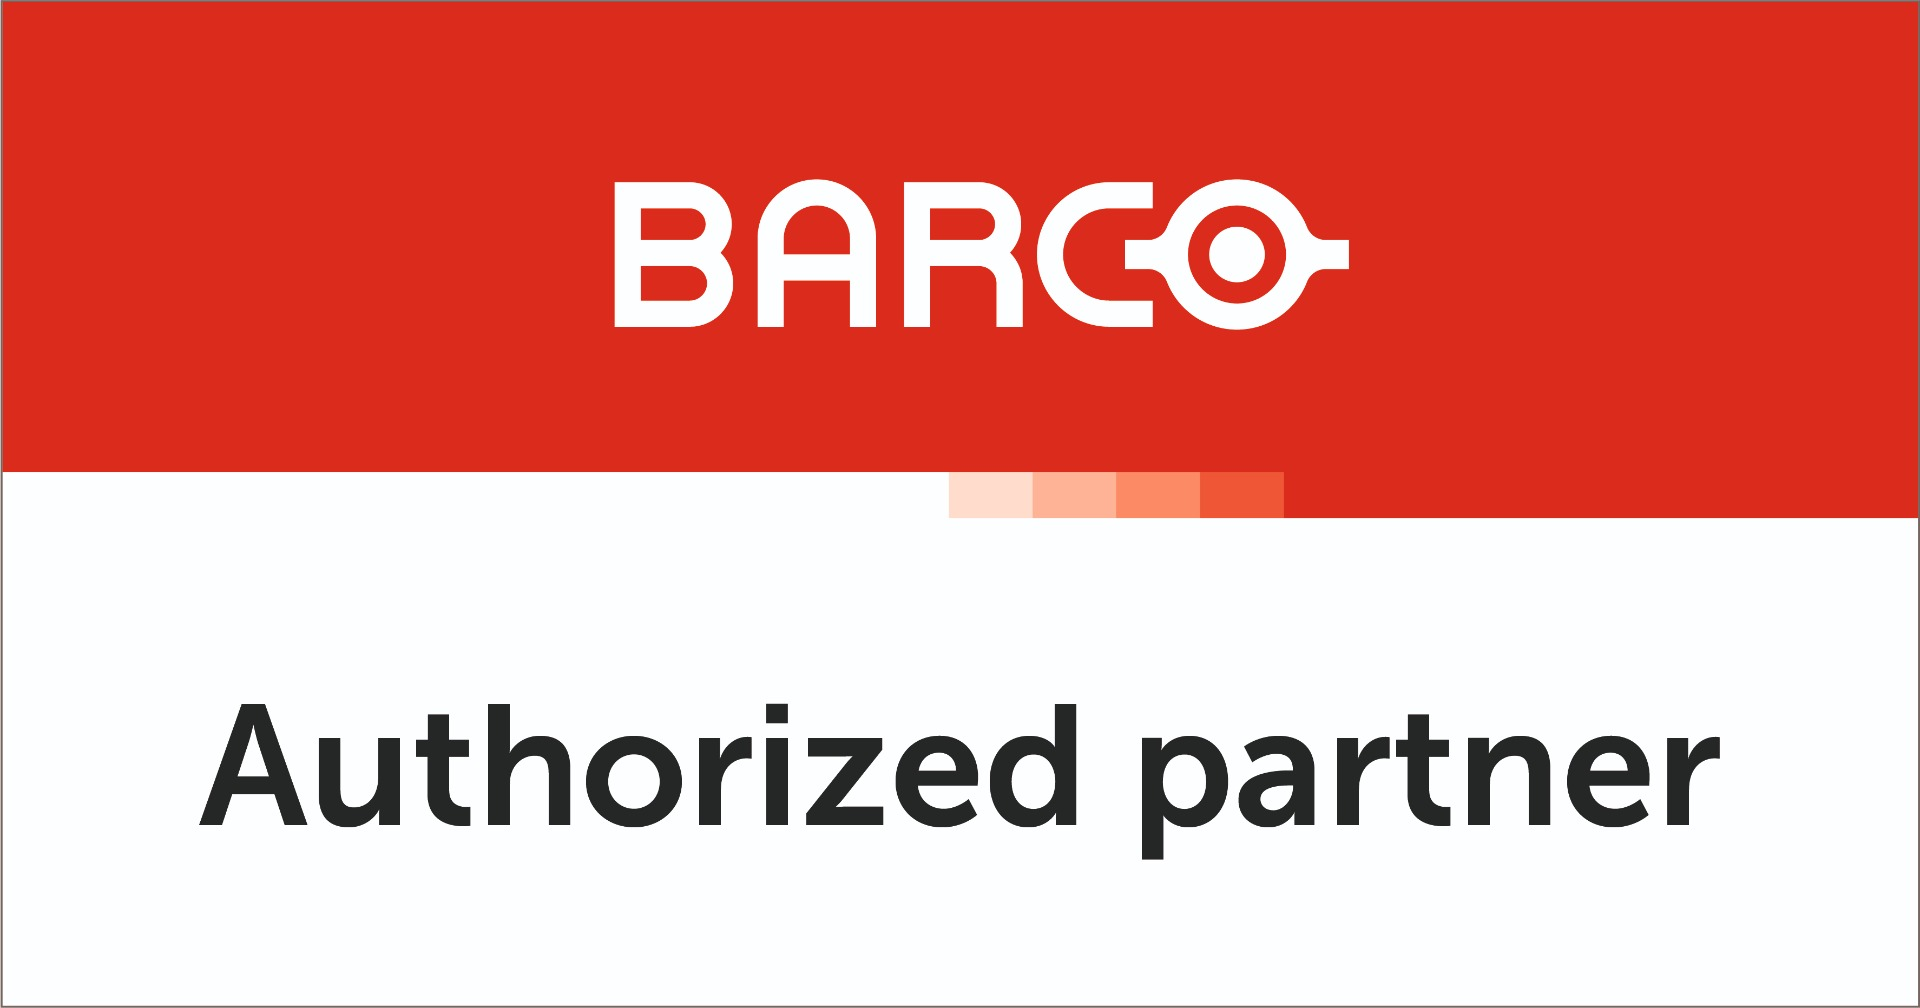 Barco Authorised Partner